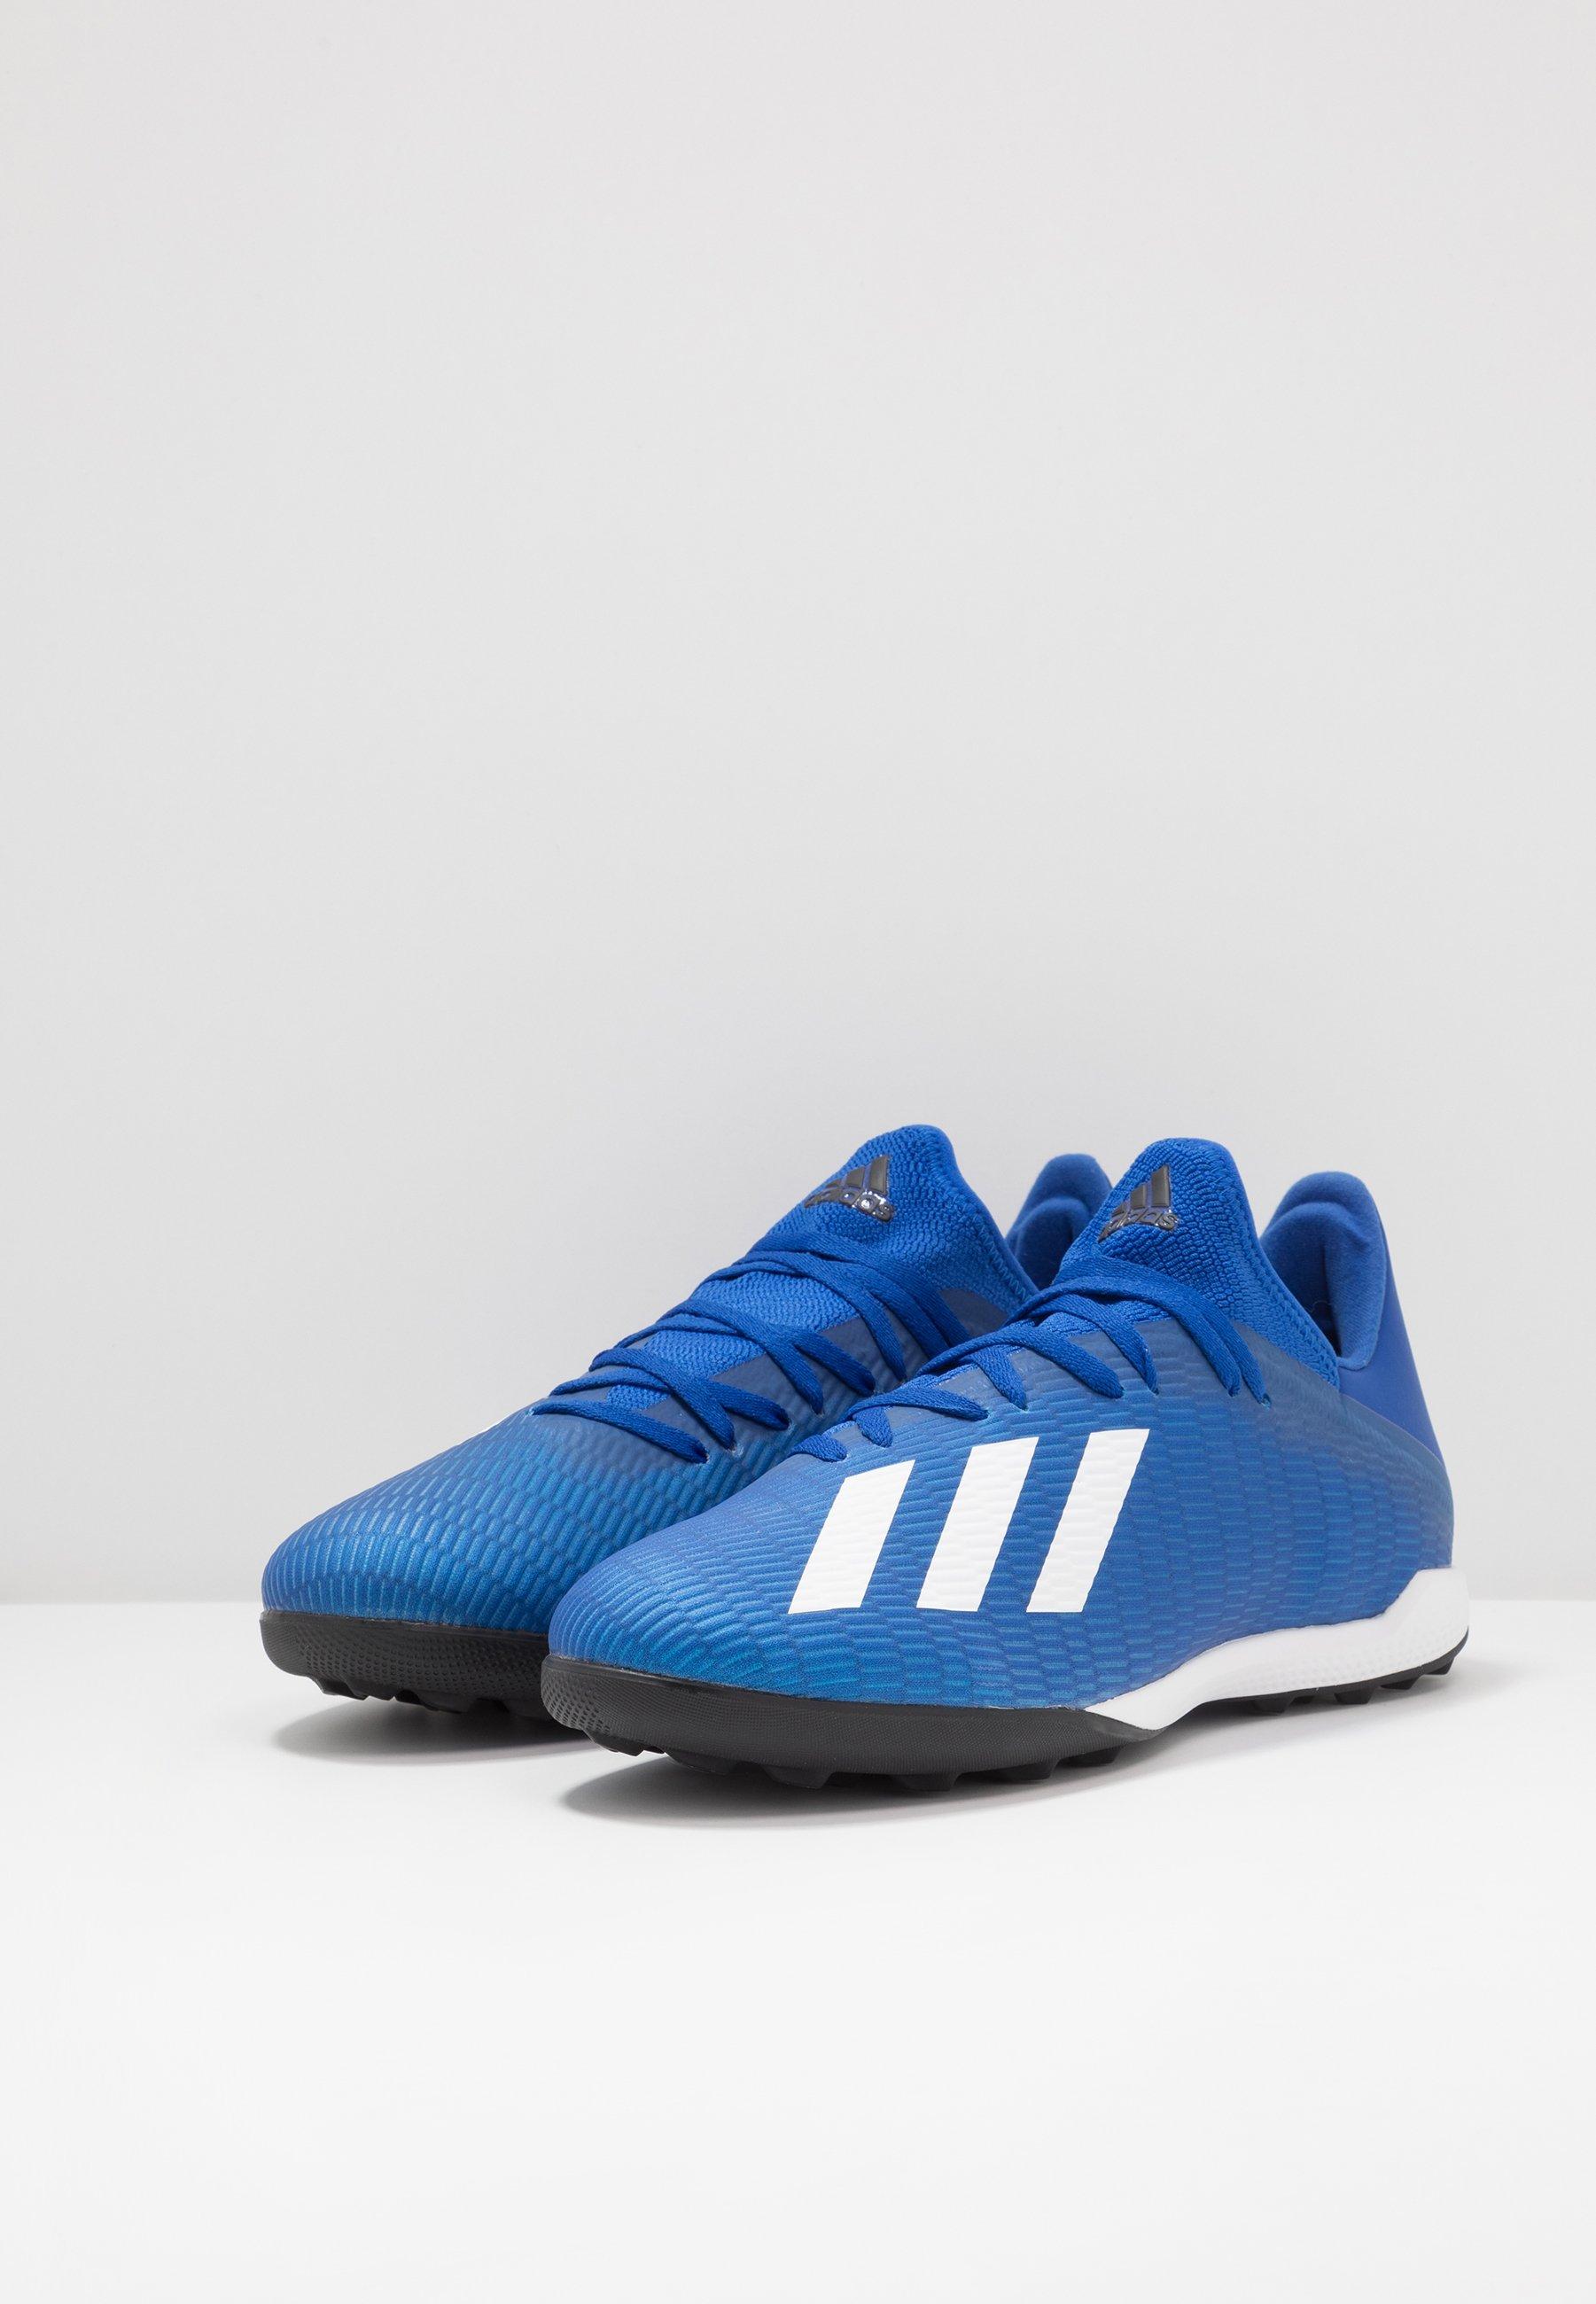 adidas Performance X 19.3 TF - Fußballschuh Multinocken - royal blue/footwear white/core black/blau - Herrenschuhe xai4v